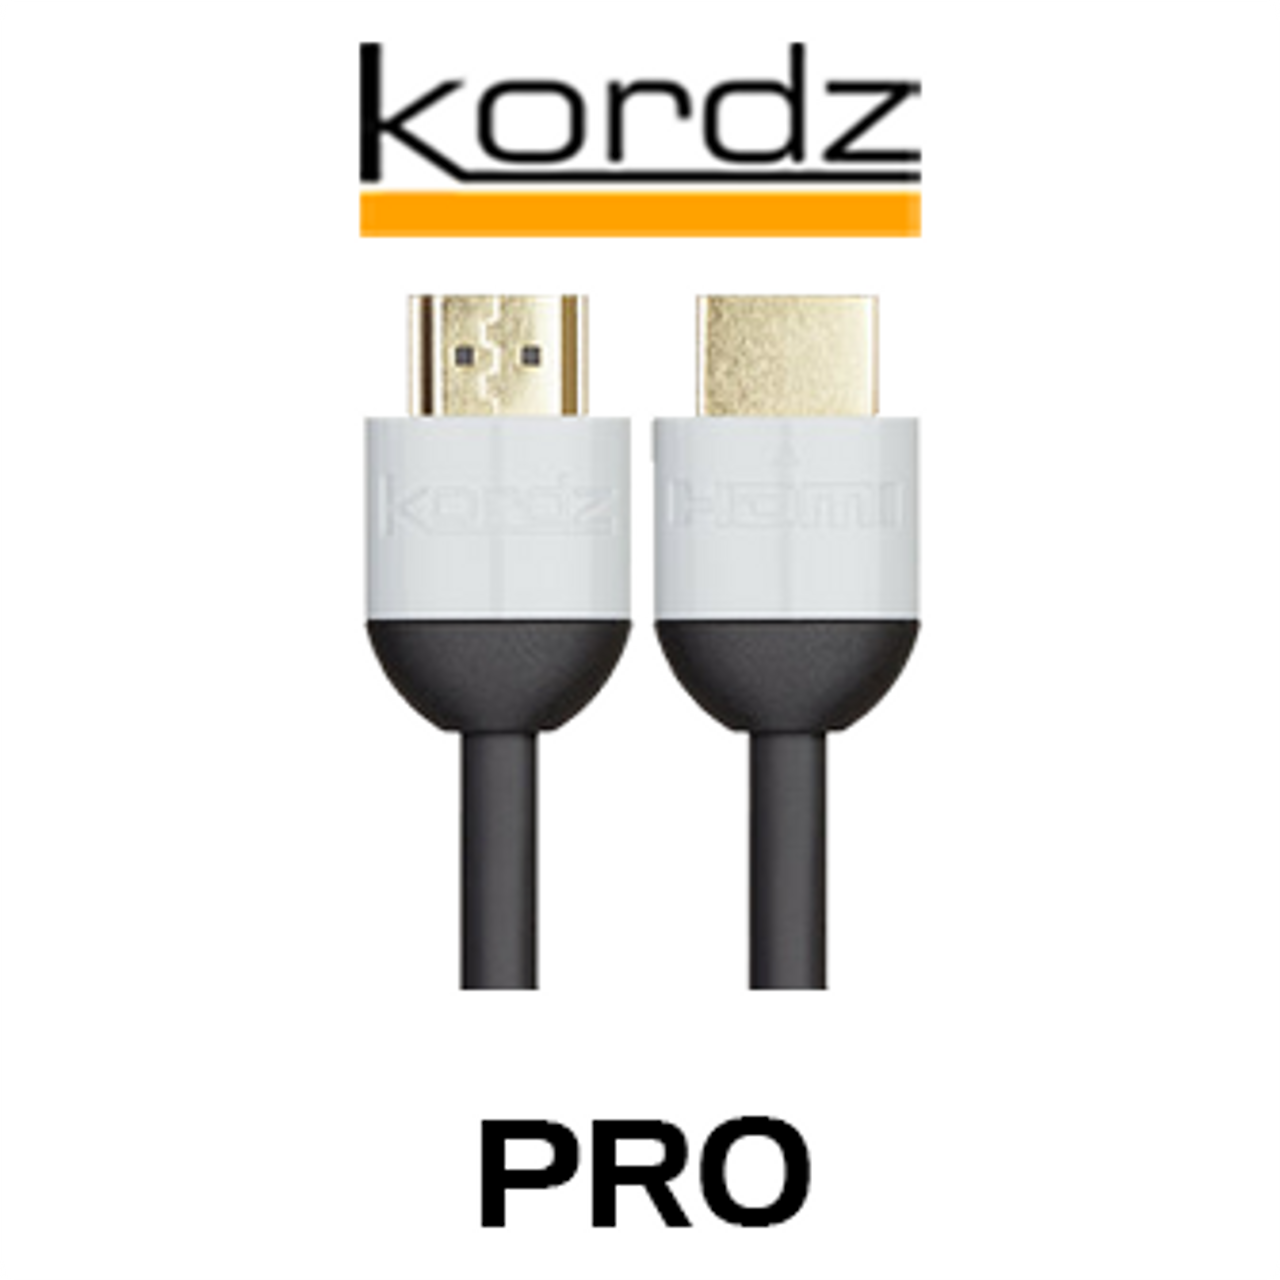 Kordz_Pro_High_Speed_HDMI_Cable_With_Ethernet_TIMG__00062.1541632812?c=2 kordz pro uhd high speed hdmi cable with ethernet av australia online